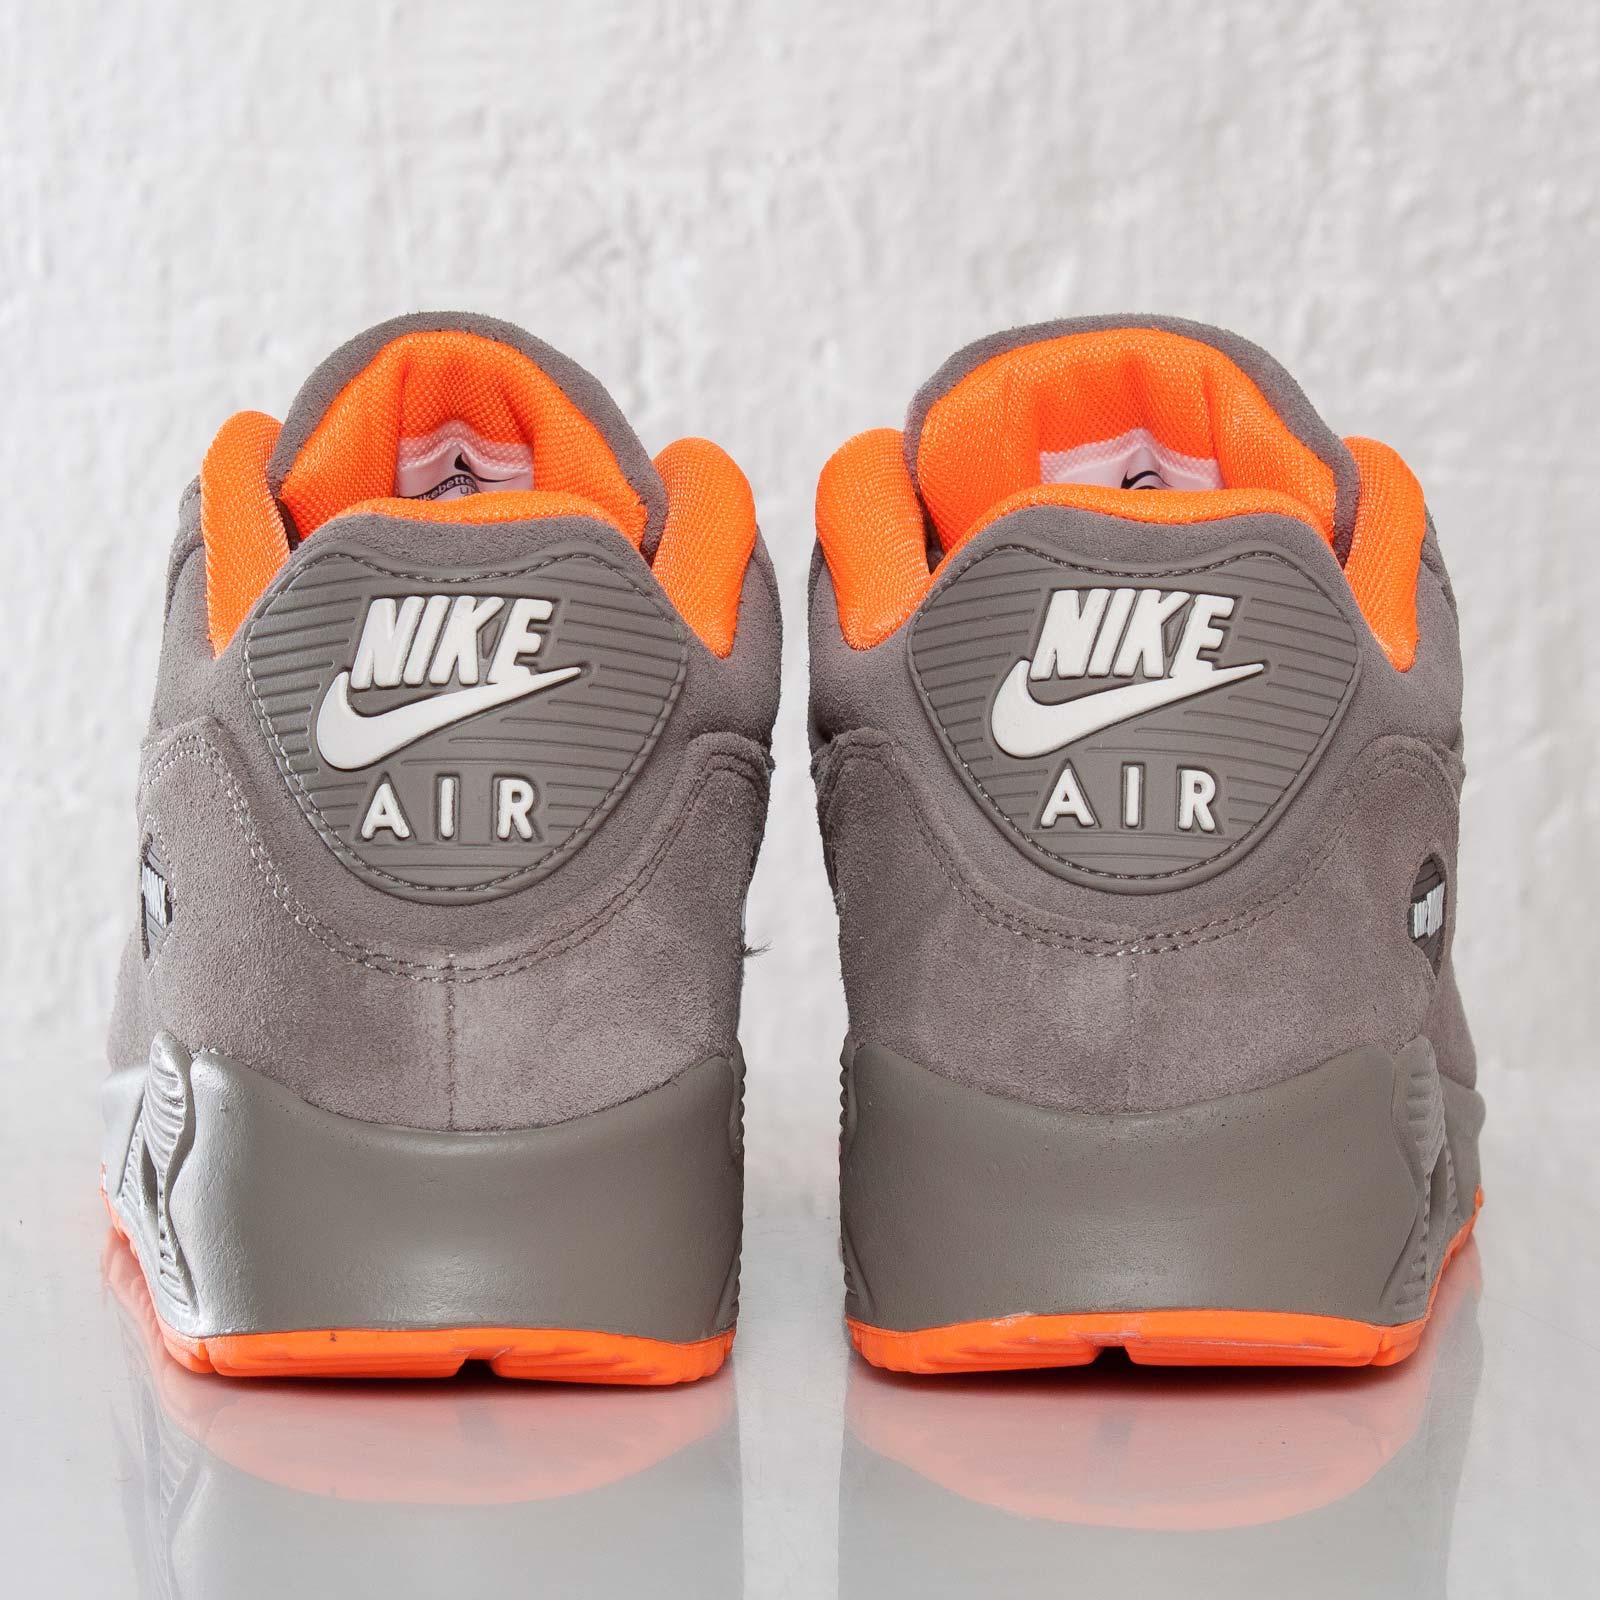 Nike Air Max 90 Milano QS - 586848-221 - SNS | sneakers ...